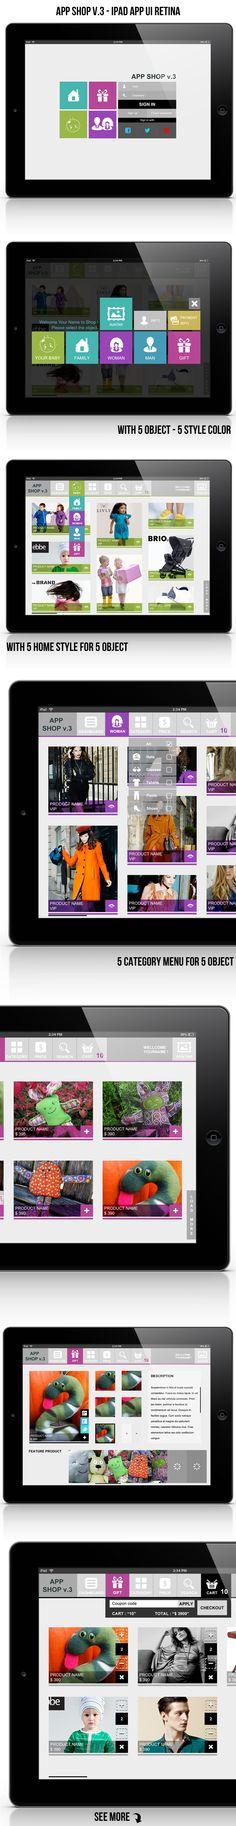 App Shop v.3 - Ipad App UI Retina / $5  Thanks for watching.  #ui #app #shop